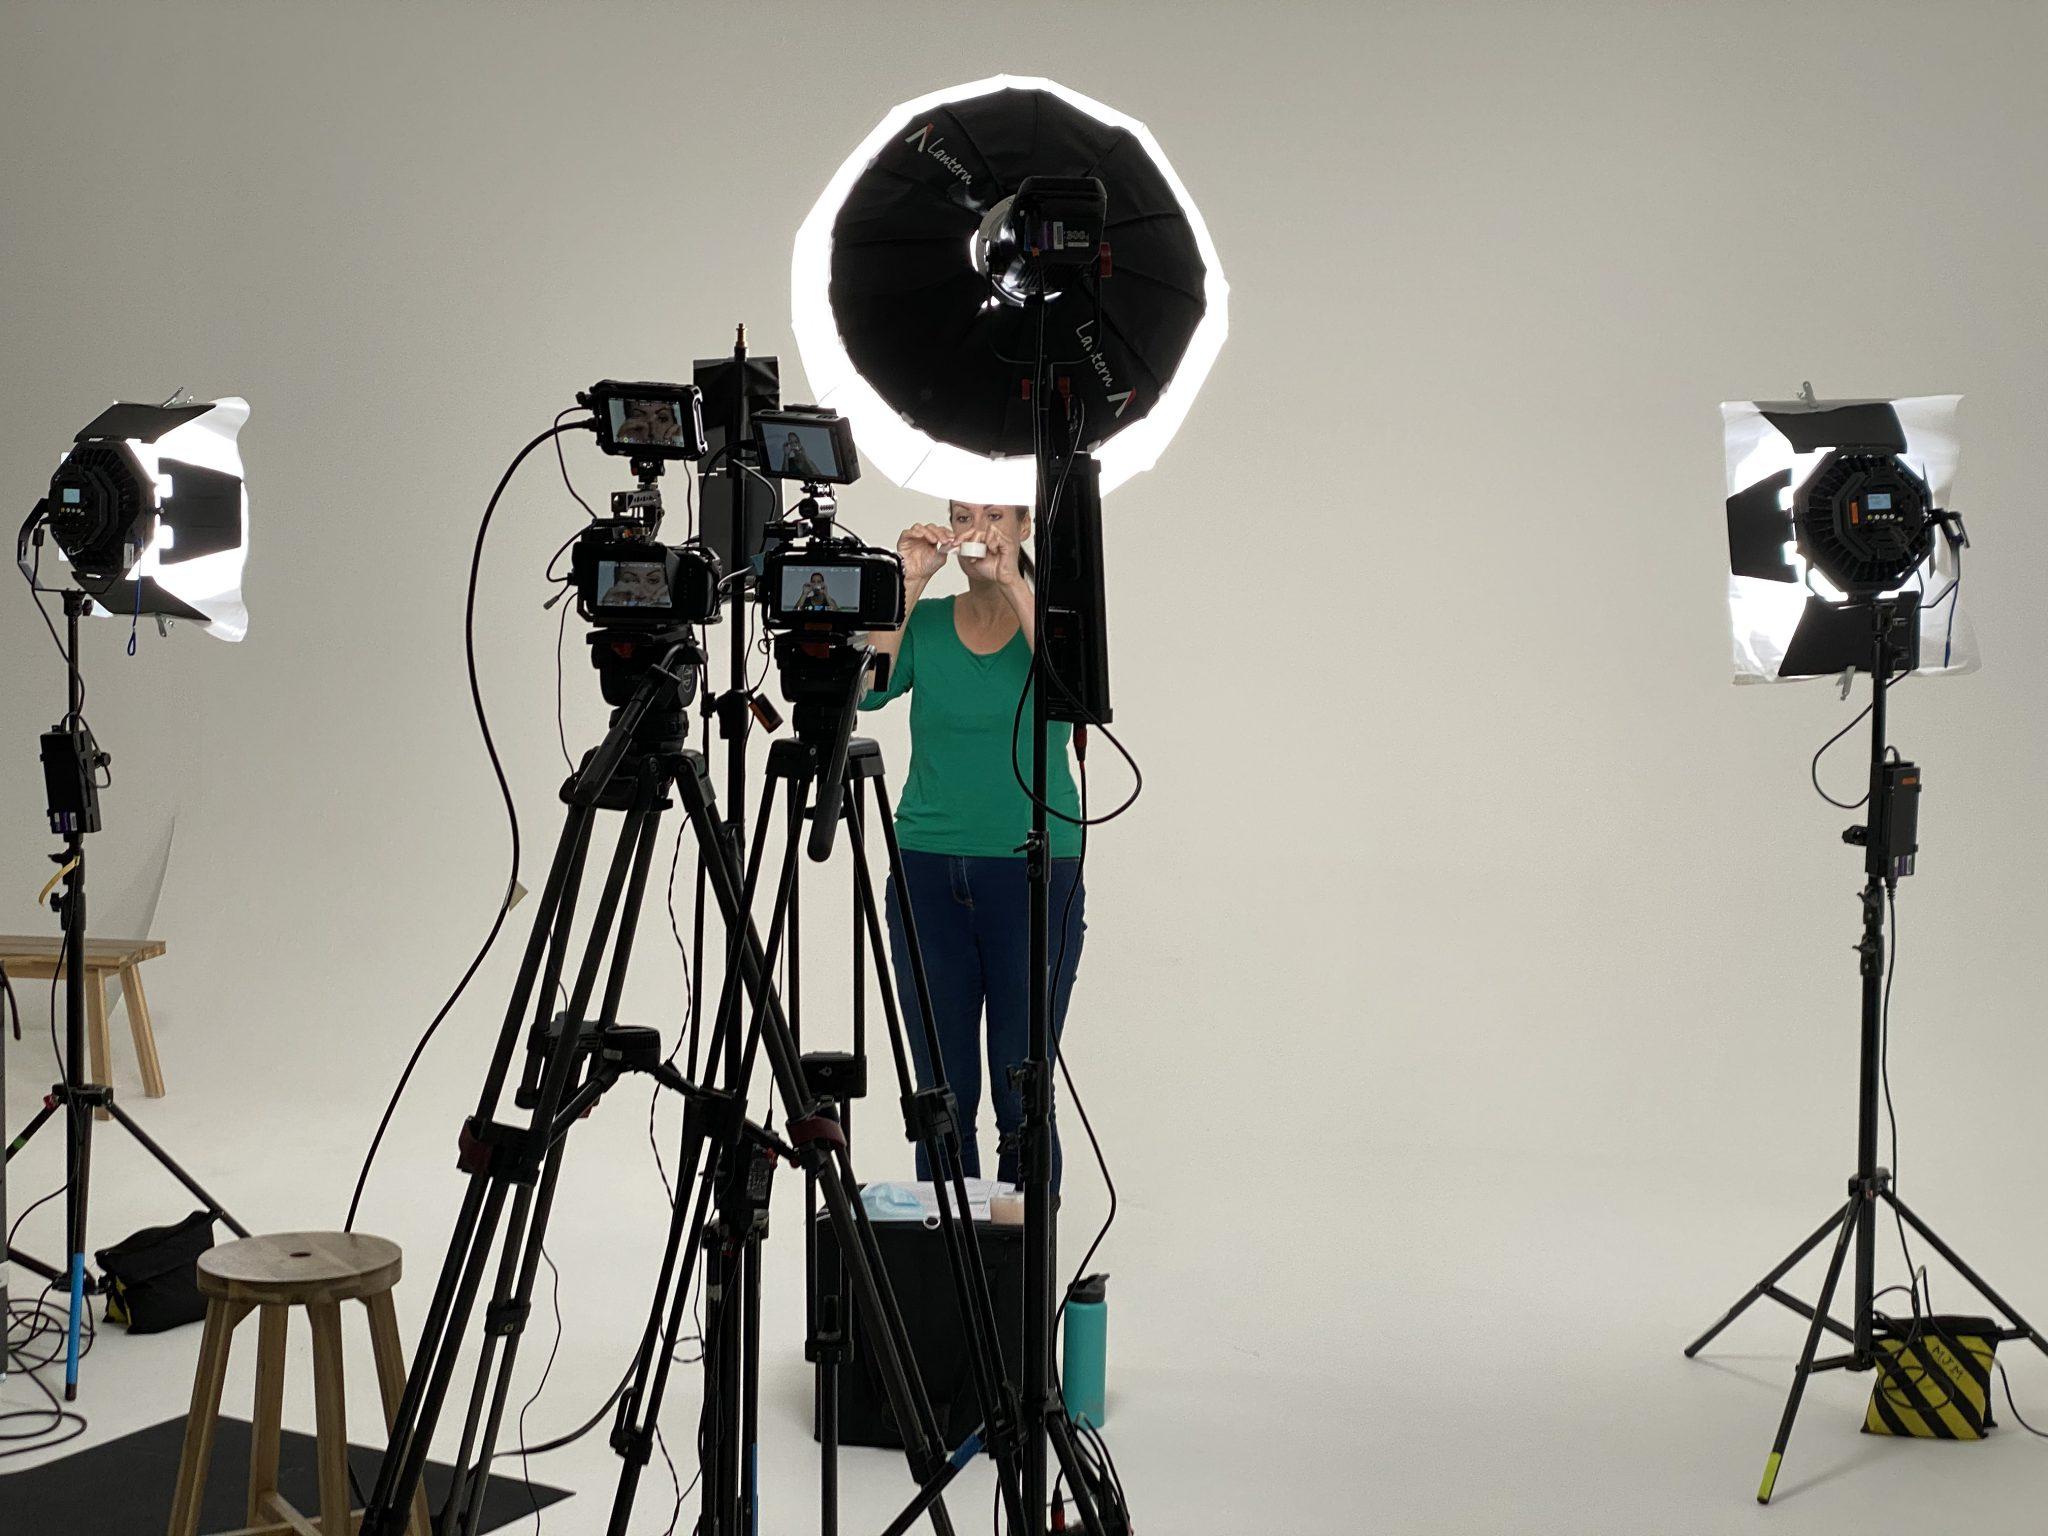 2 x Blackmagic 6K cameras